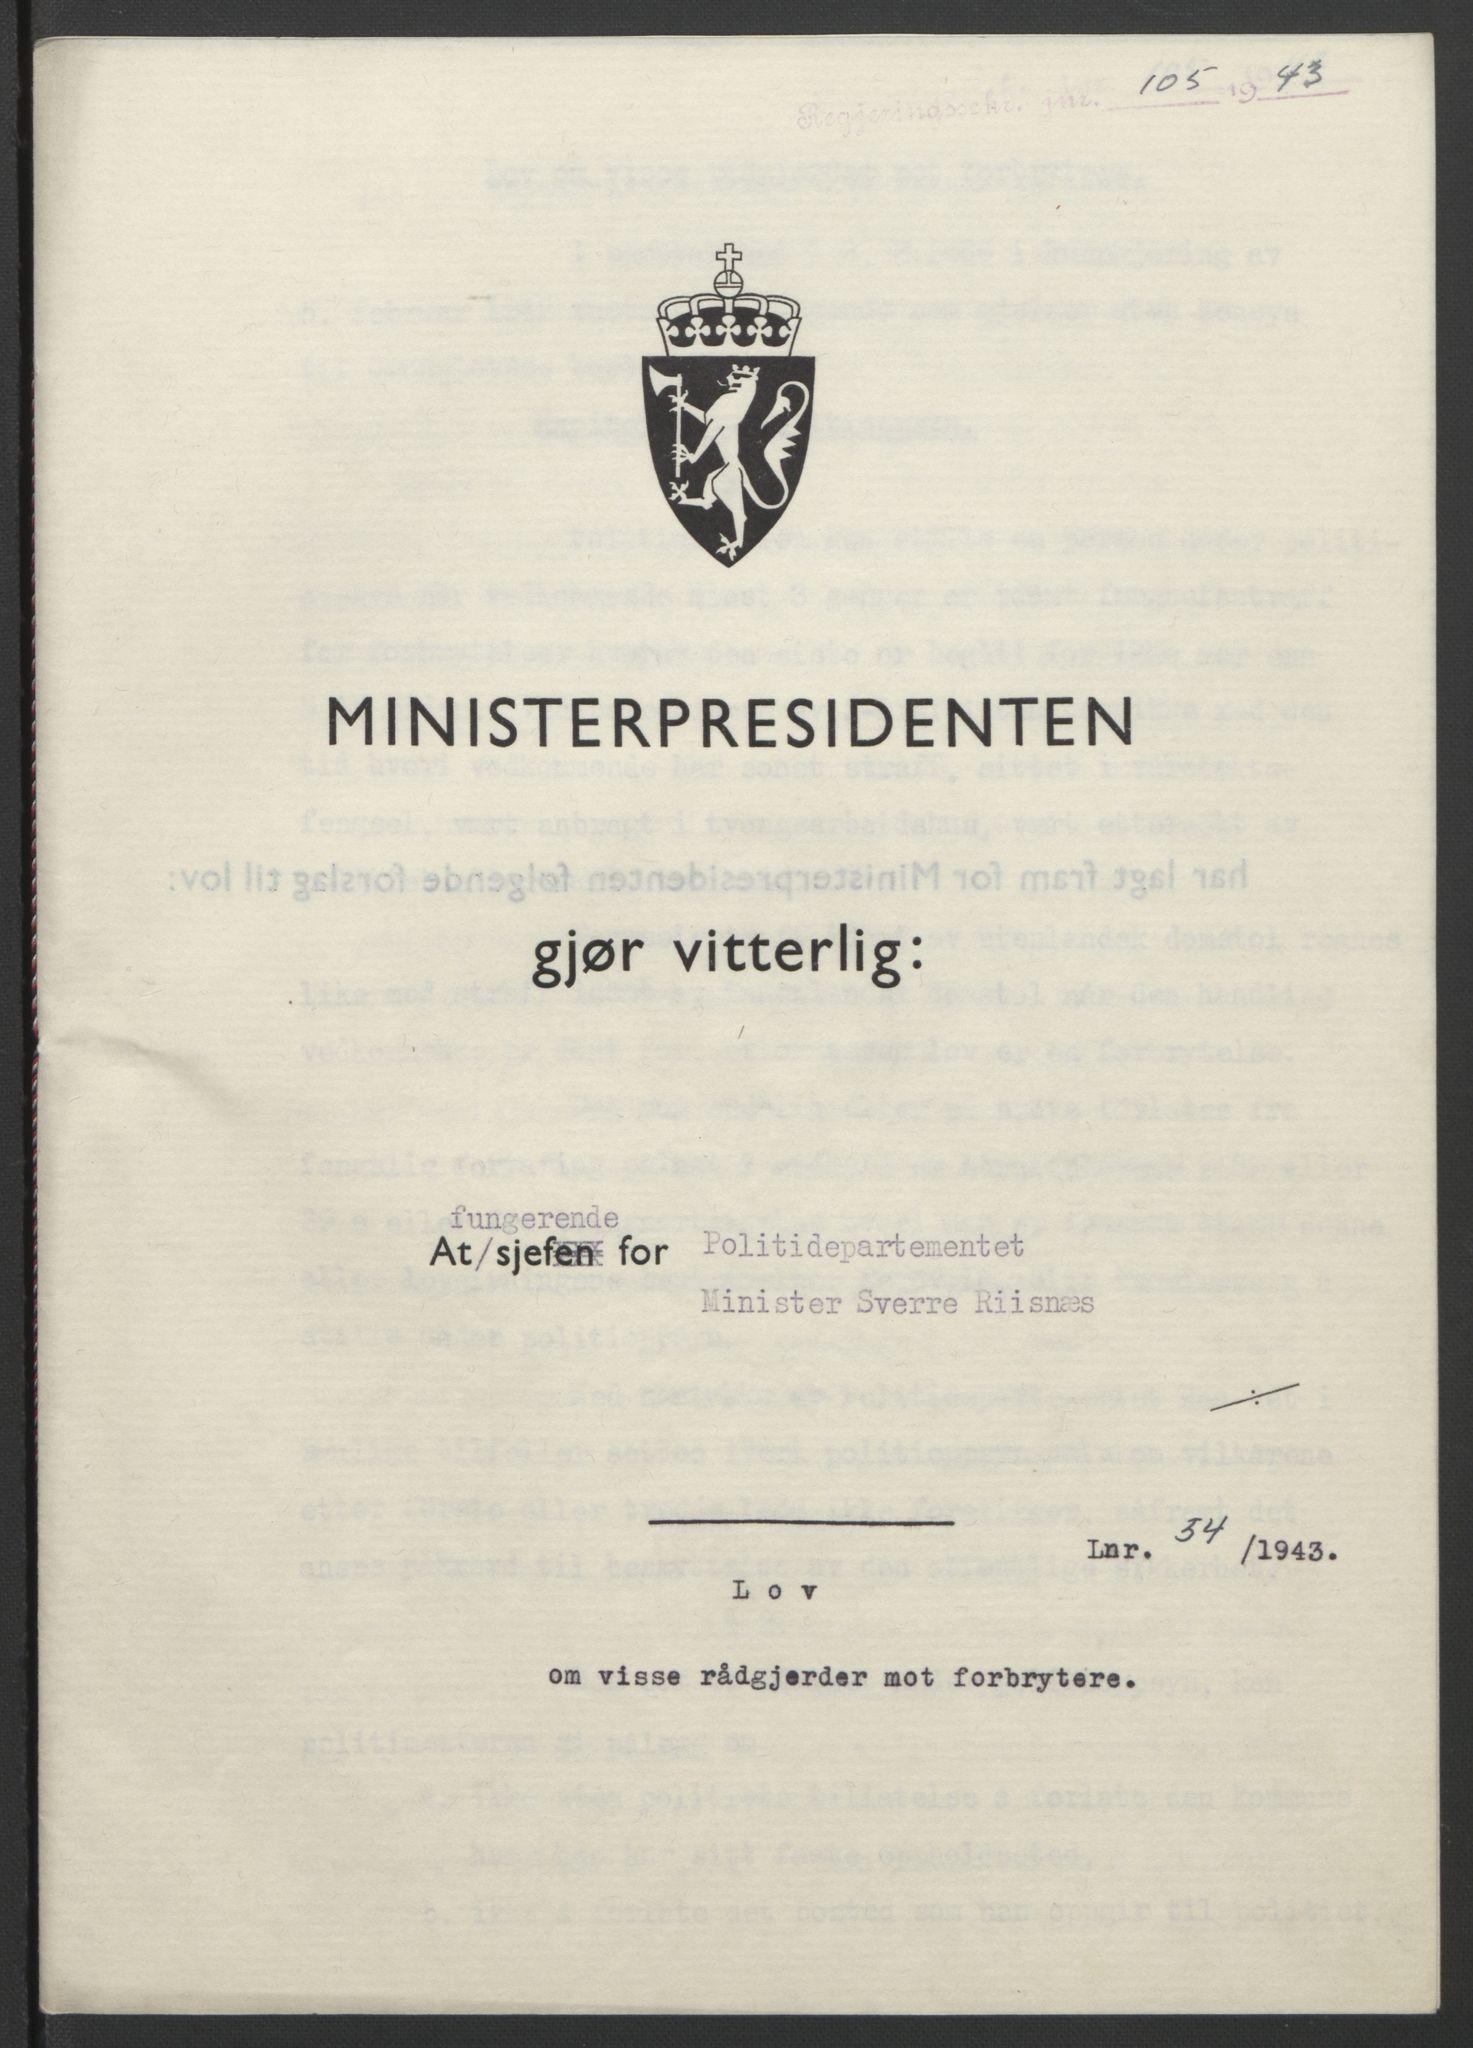 RA, NS-administrasjonen 1940-1945 (Statsrådsekretariatet, de kommisariske statsråder mm), D/Db/L0099: Lover, 1943, s. 241